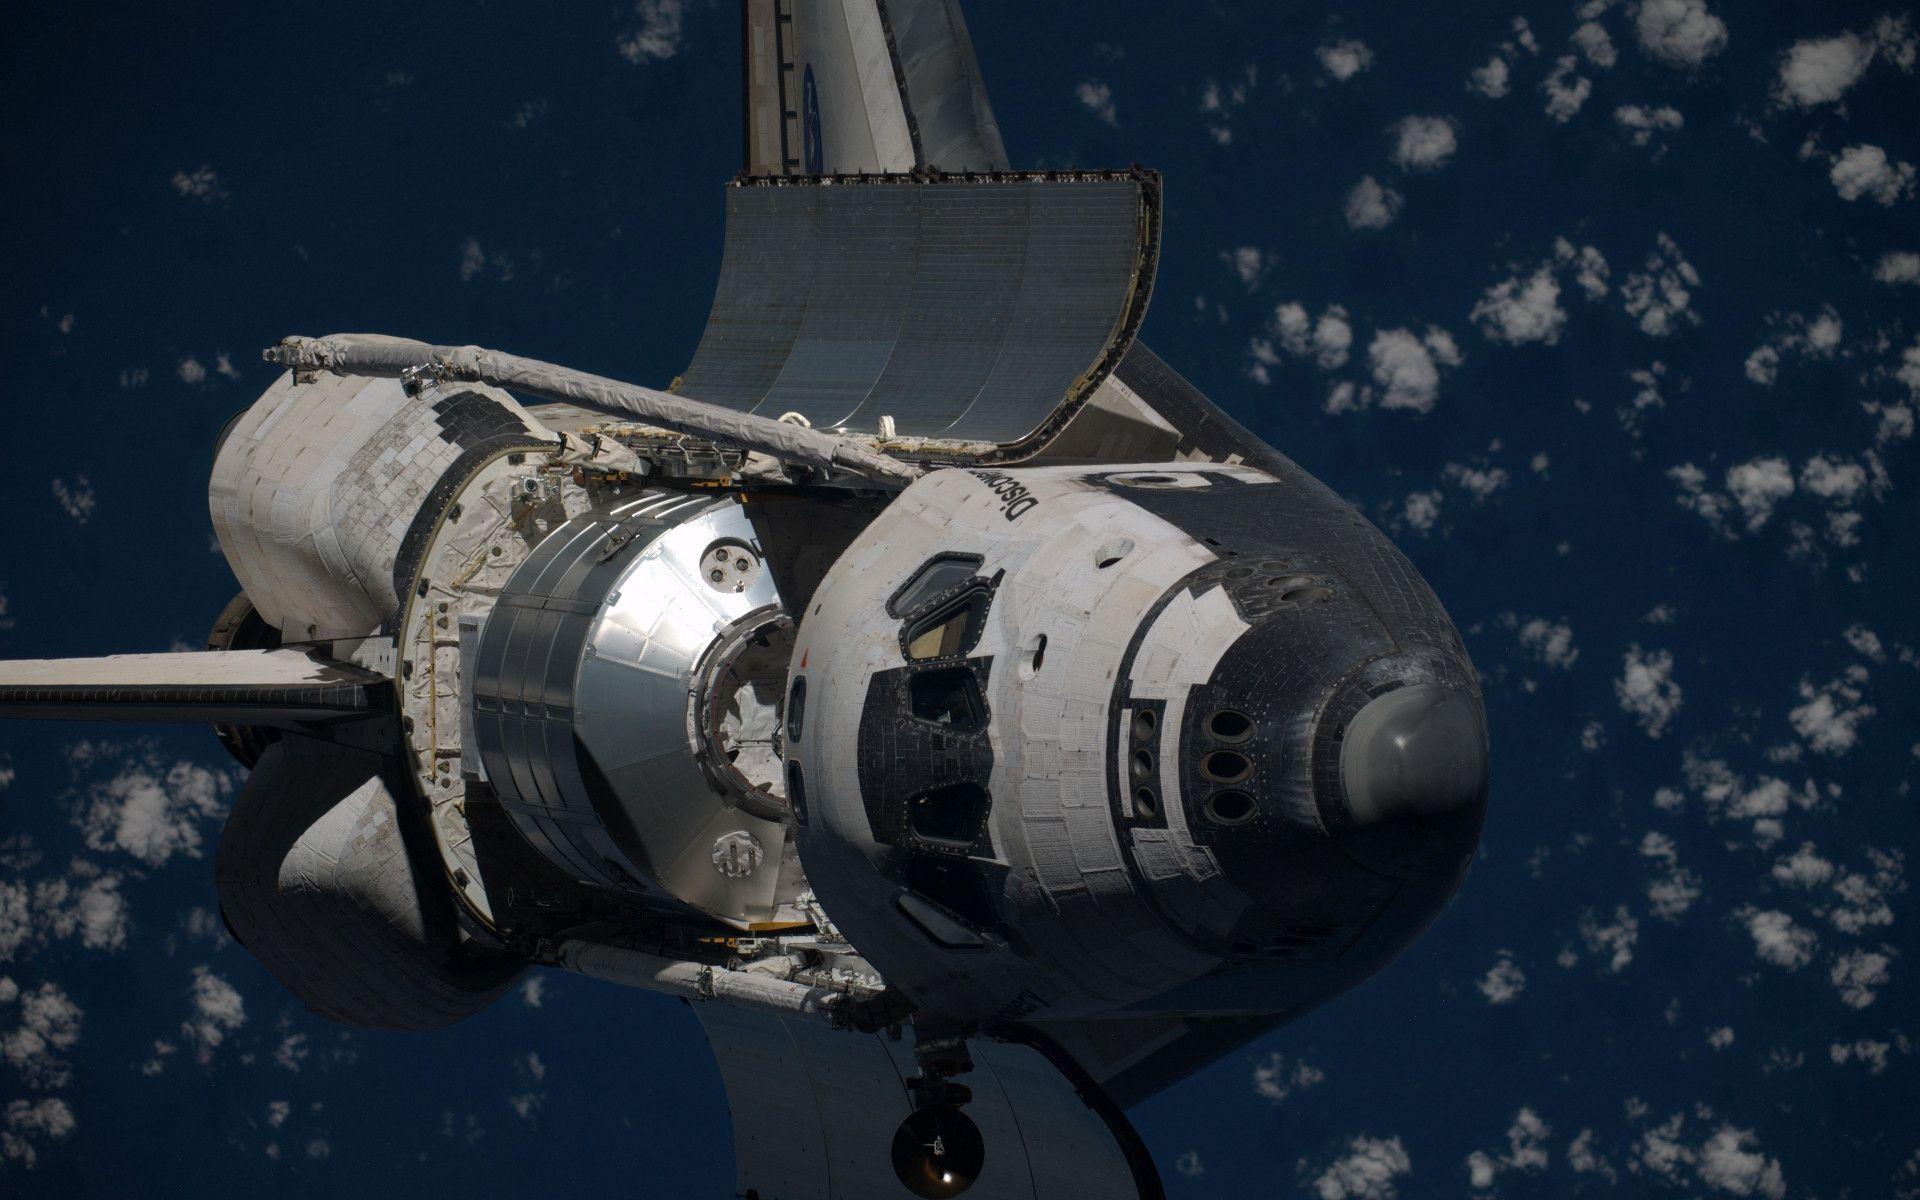 nasa new shuttle spacecraft - photo #31